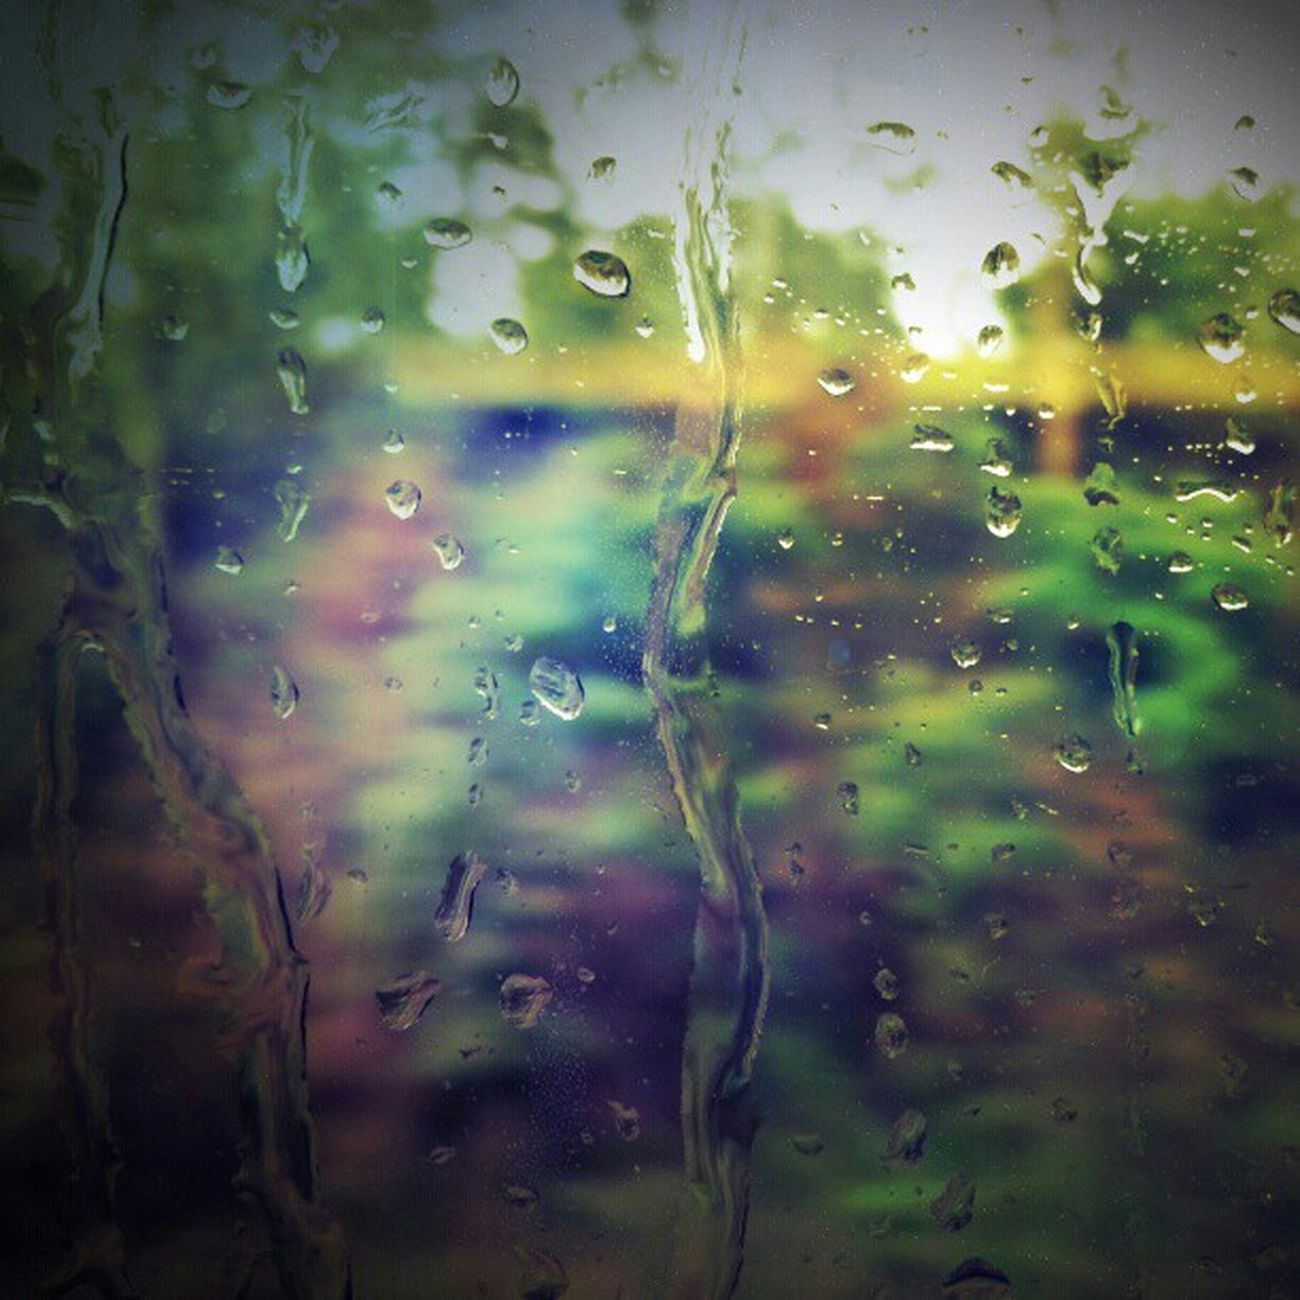 Project365, November 8th 2012, Day 37: RAIN BITCH! Project365 365project Day37 Rain Rainbow Window